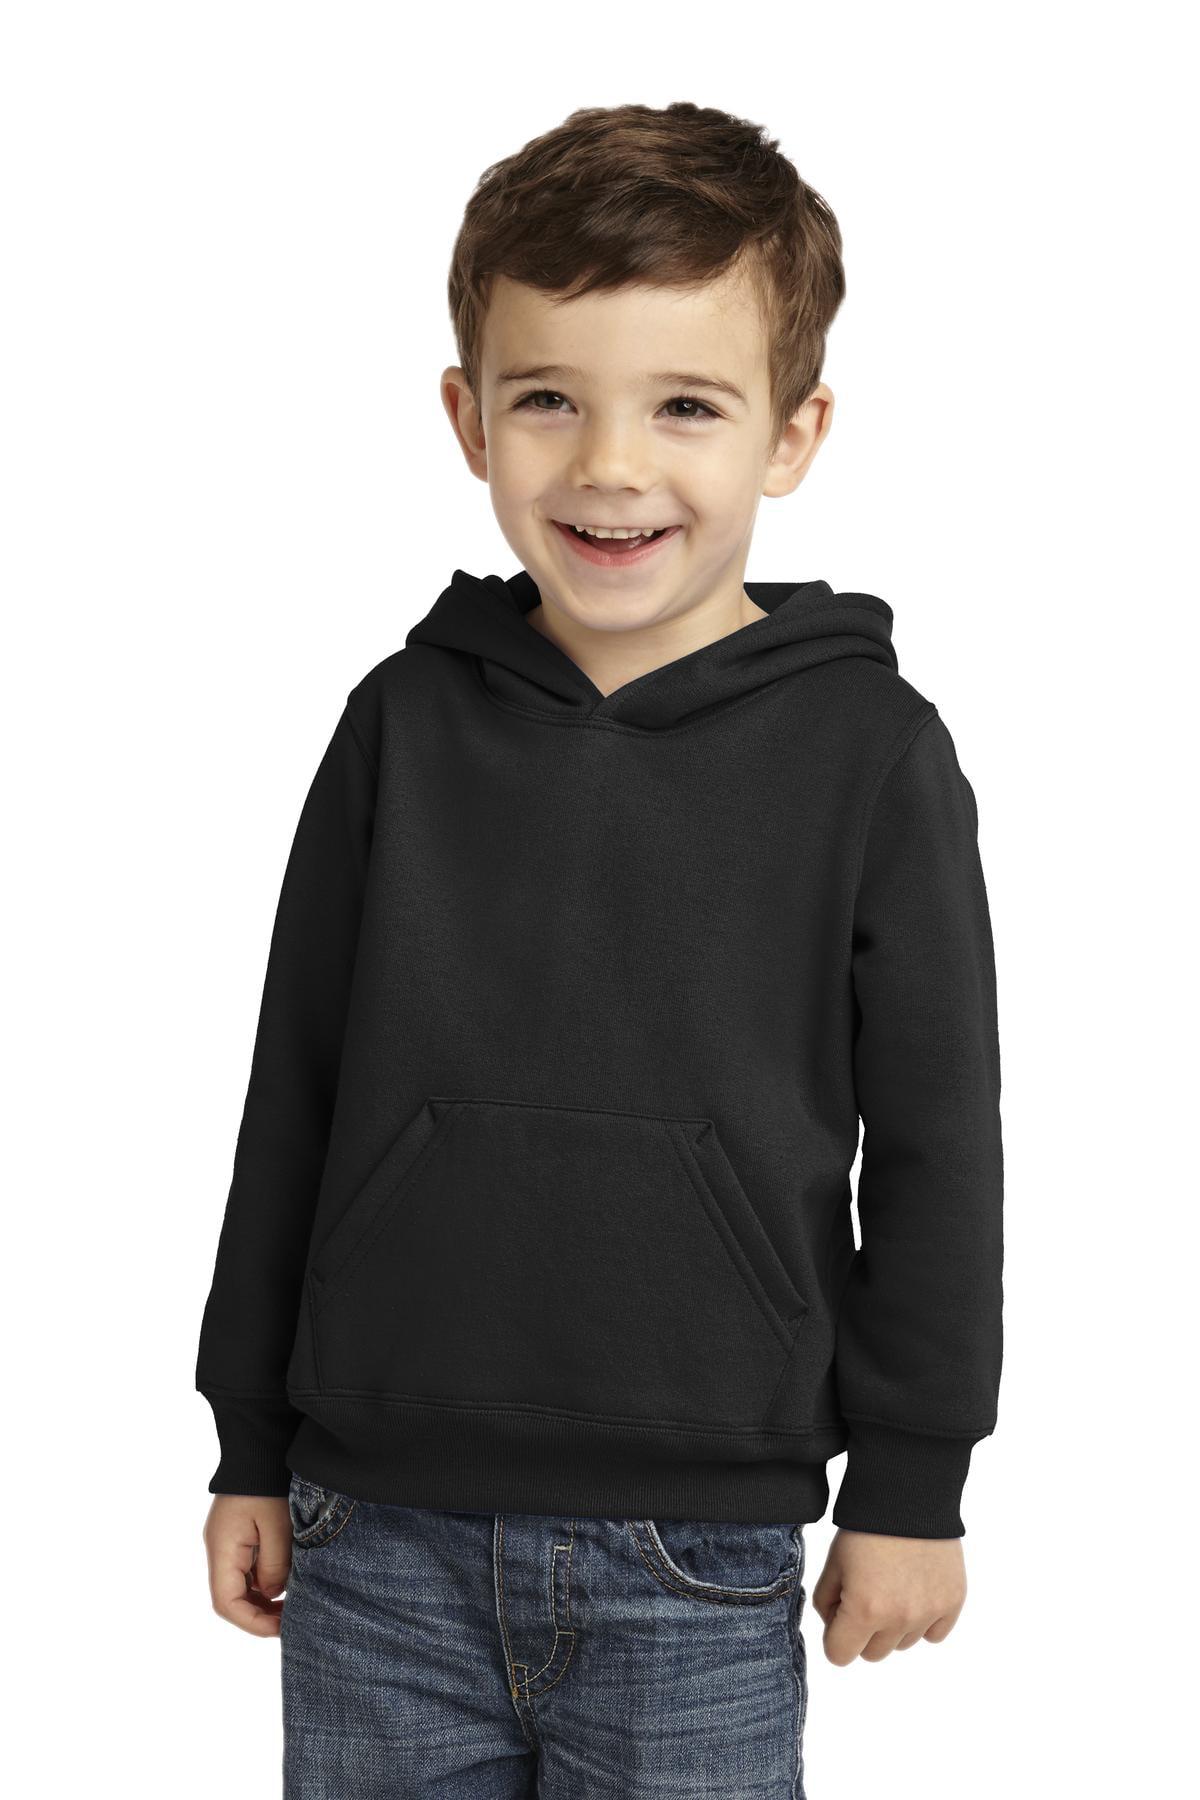 Precious Cargo Toddler Pullover Hooded Sweatshirt